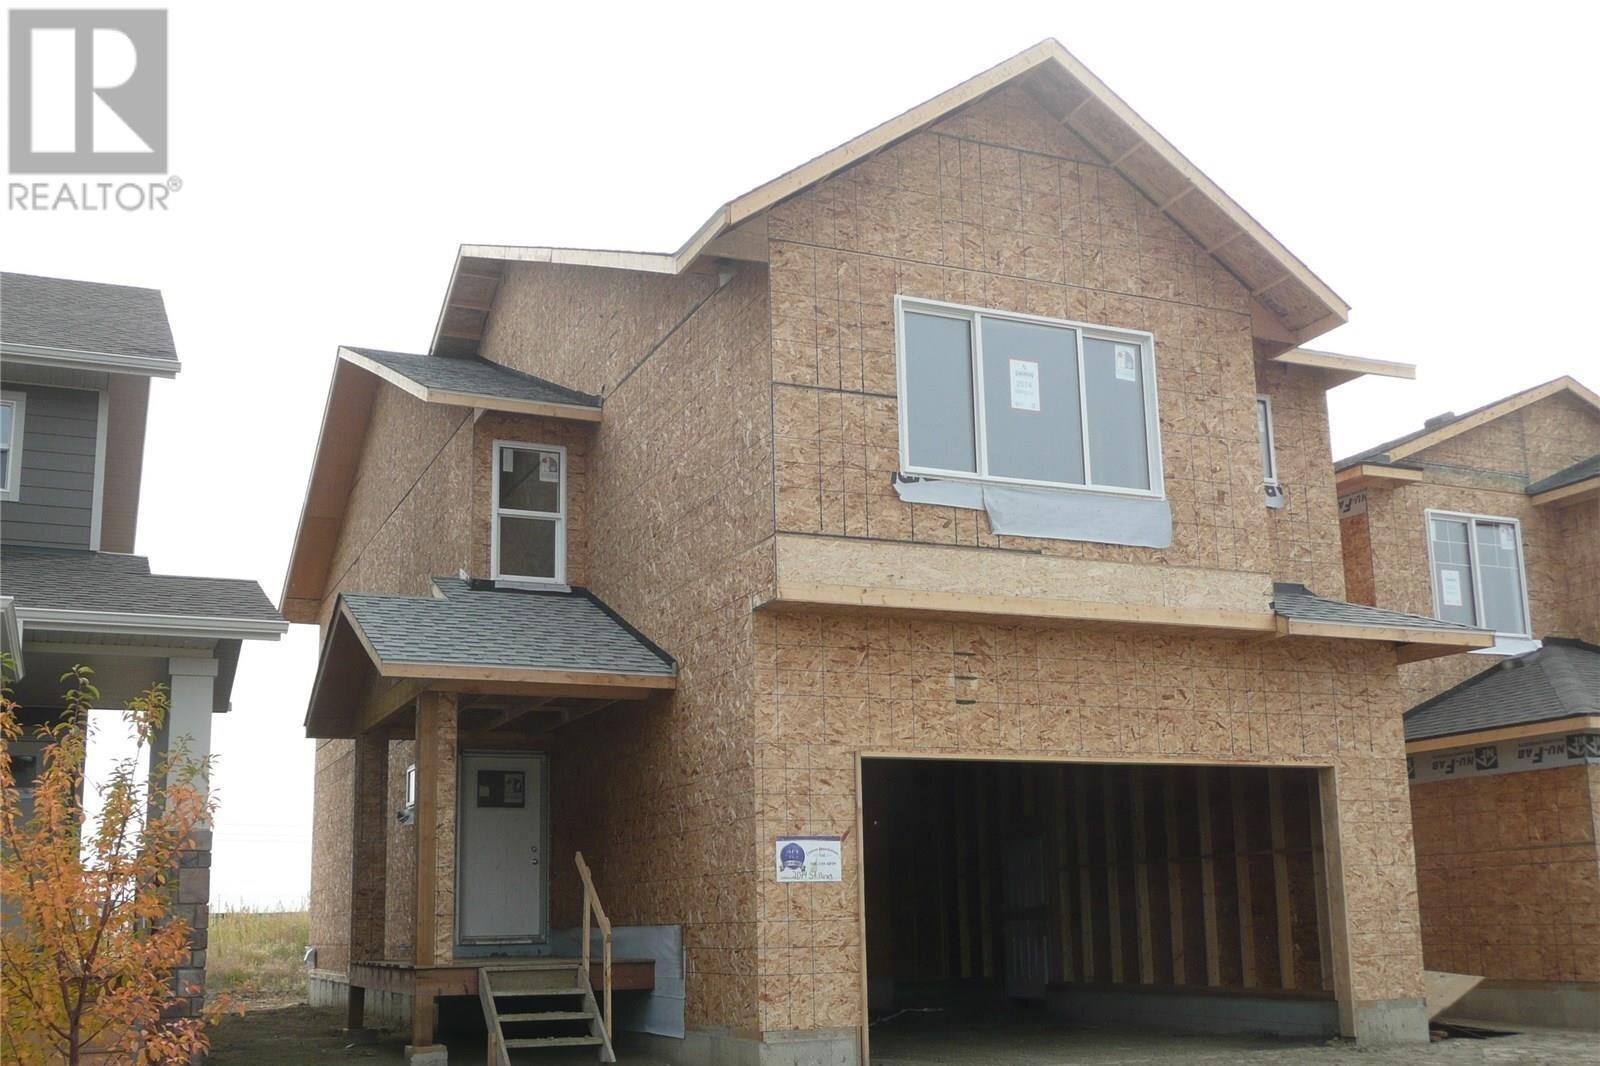 House for sale at 134 Germain Ct Saskatoon Saskatchewan - MLS: SK838200